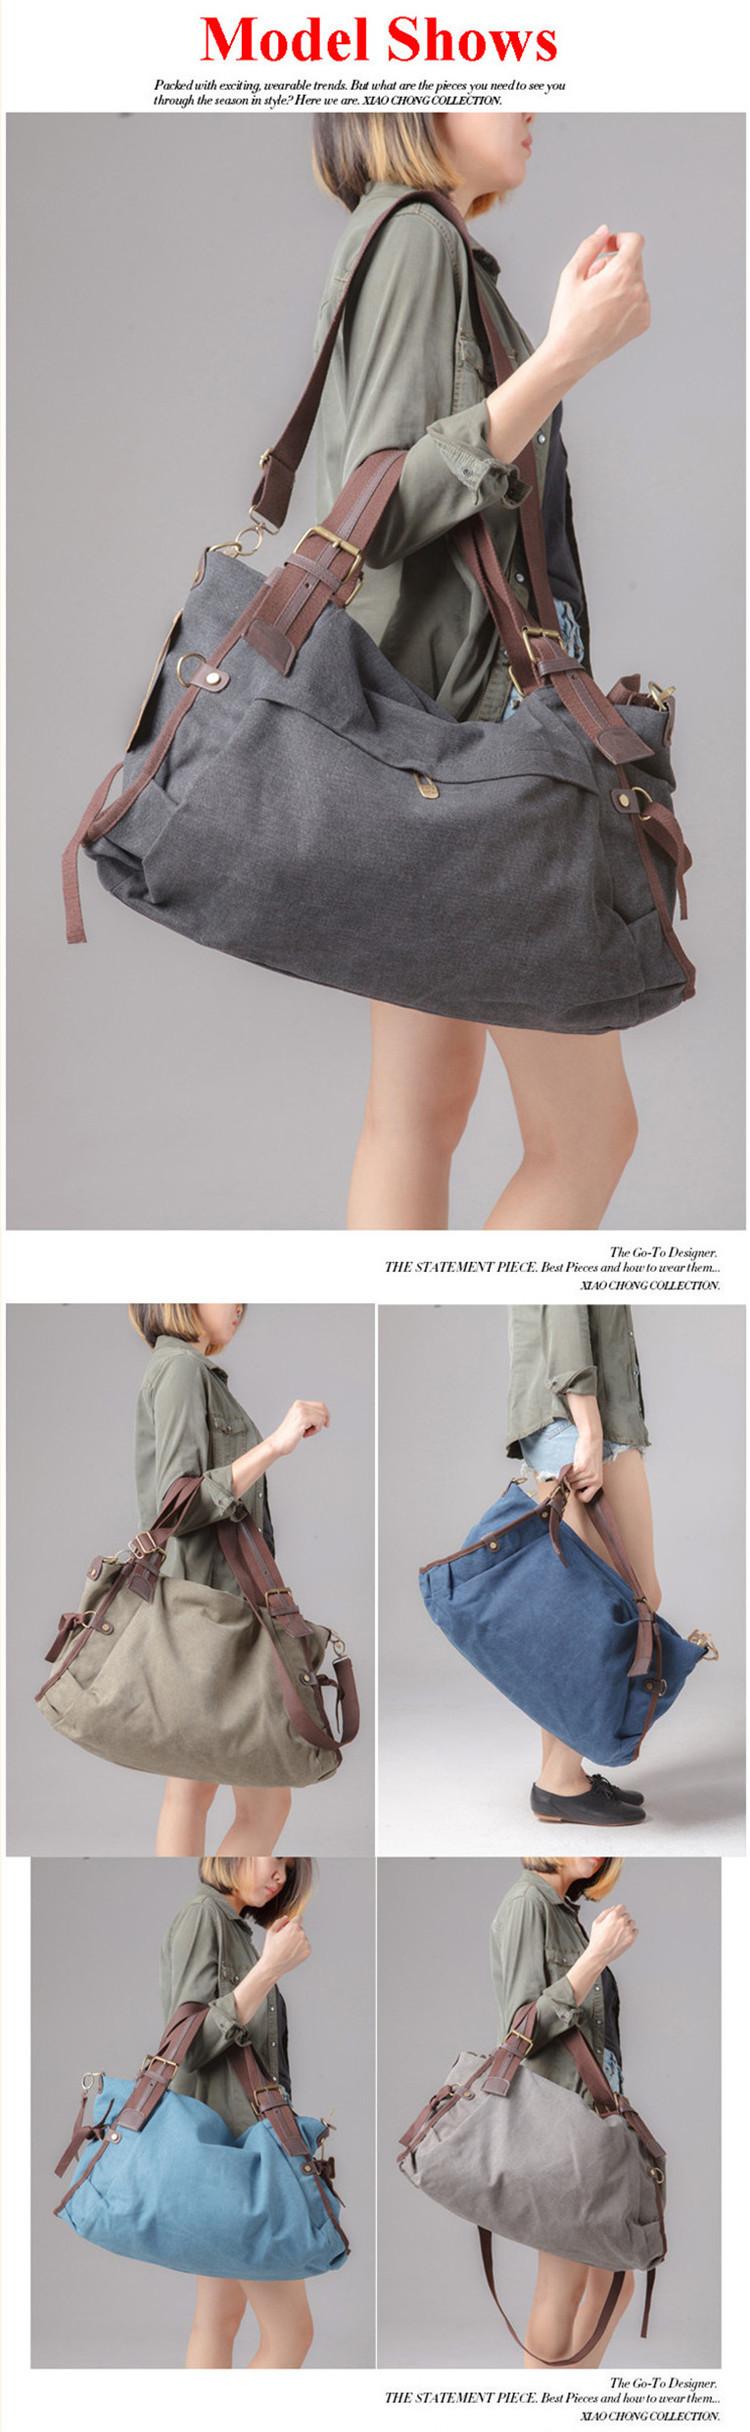 Female Handbags Multi-function Fashion Single Shoulder Bag Wear-resisting Canvas